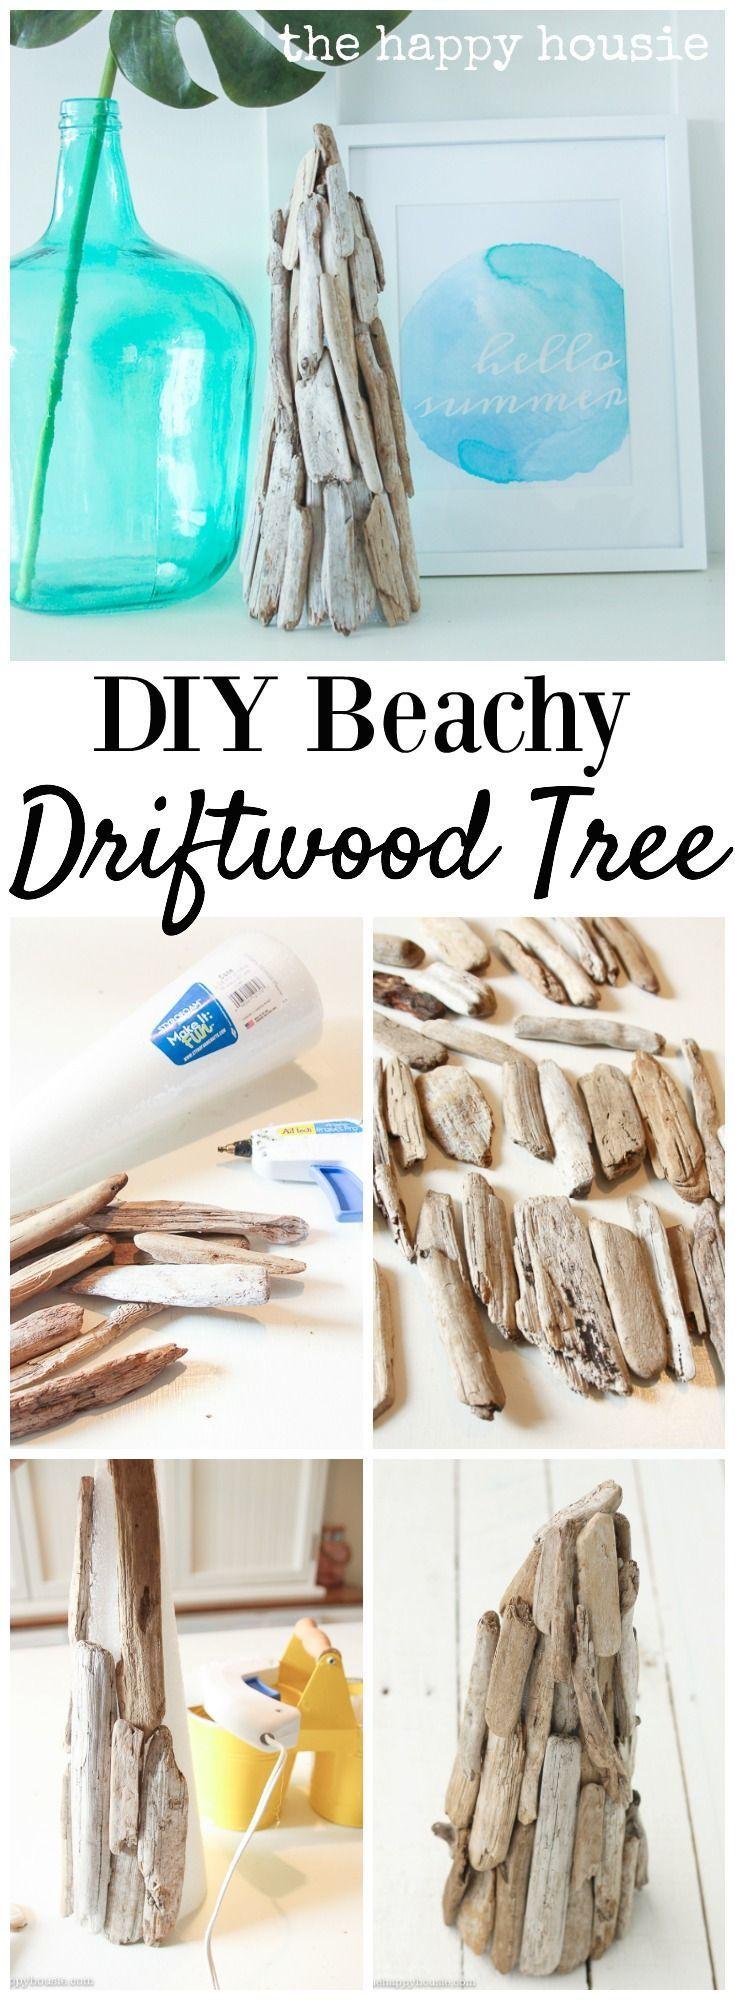 diy beachy decor driftwood tree - Beachy Decor